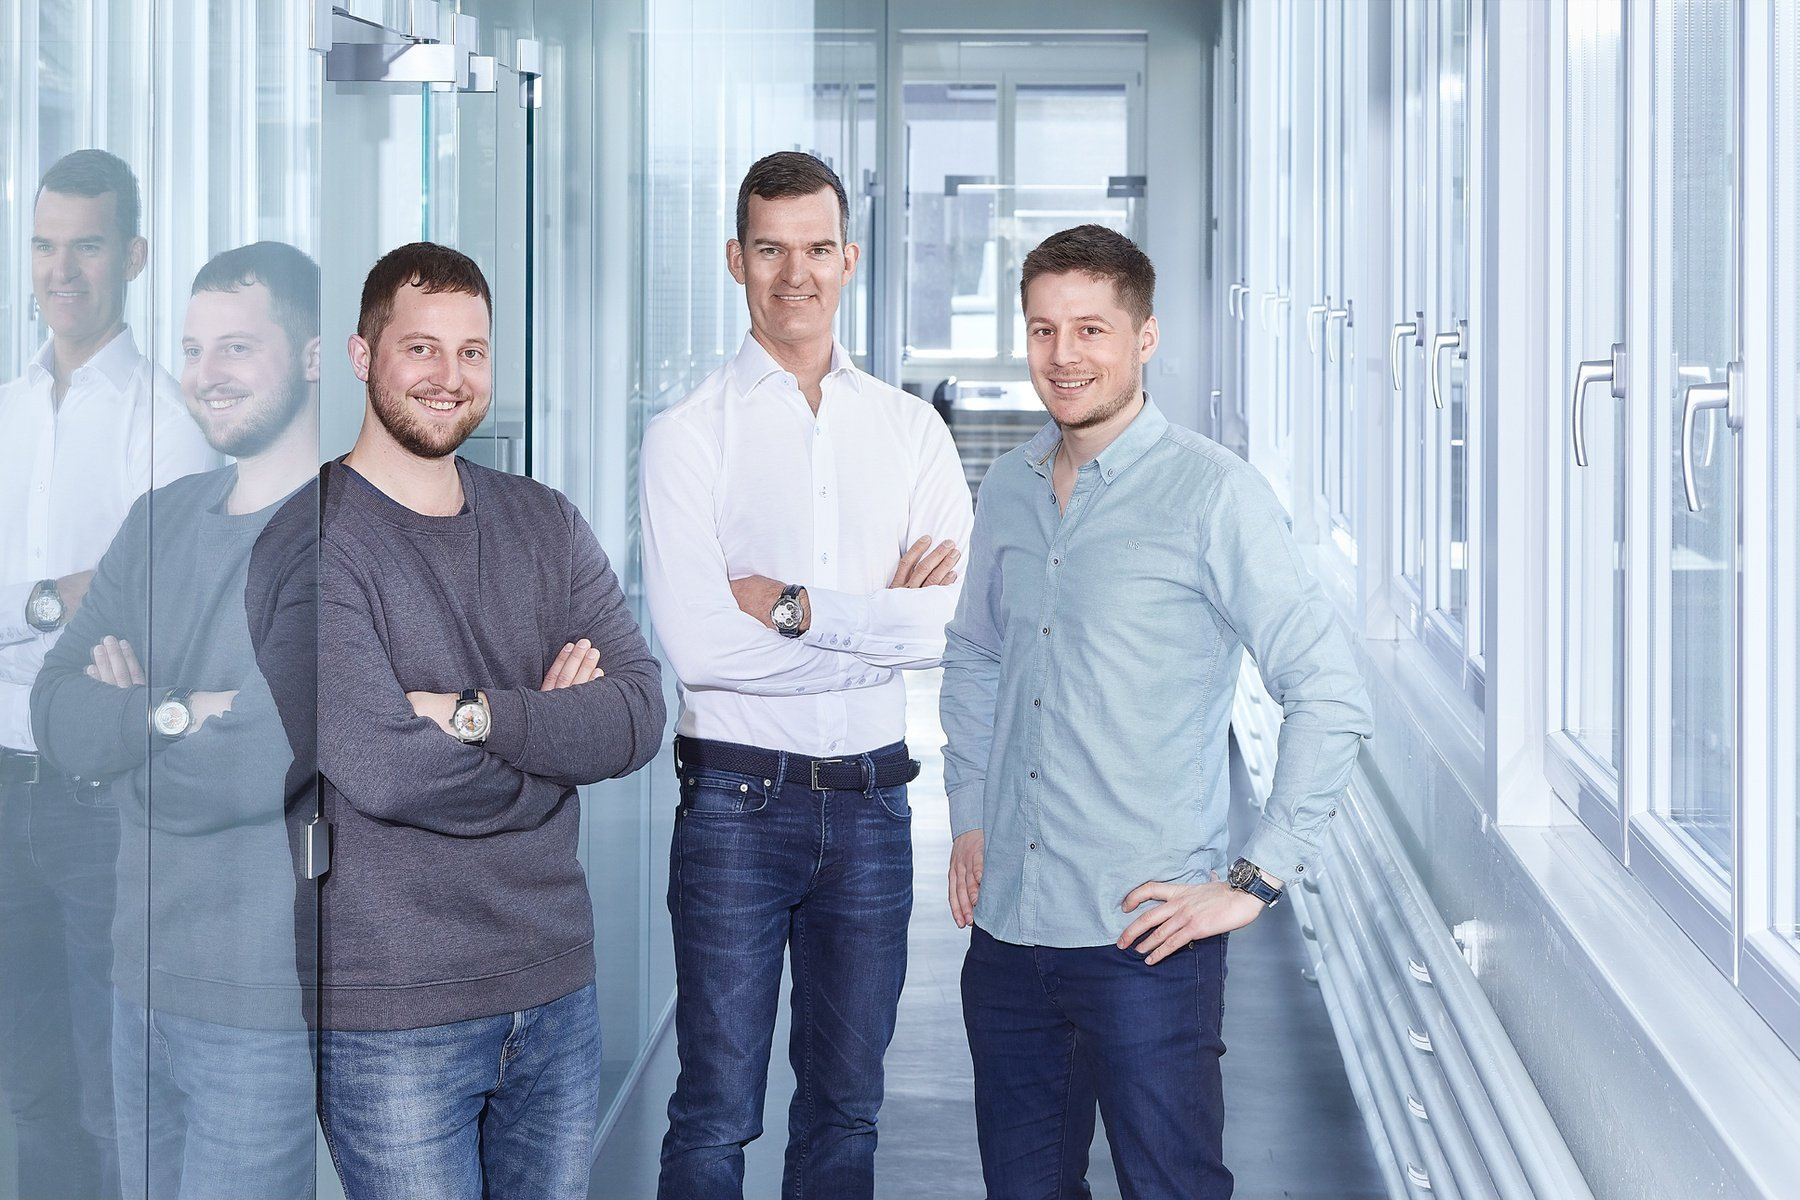 in-house design team of Armin Strom